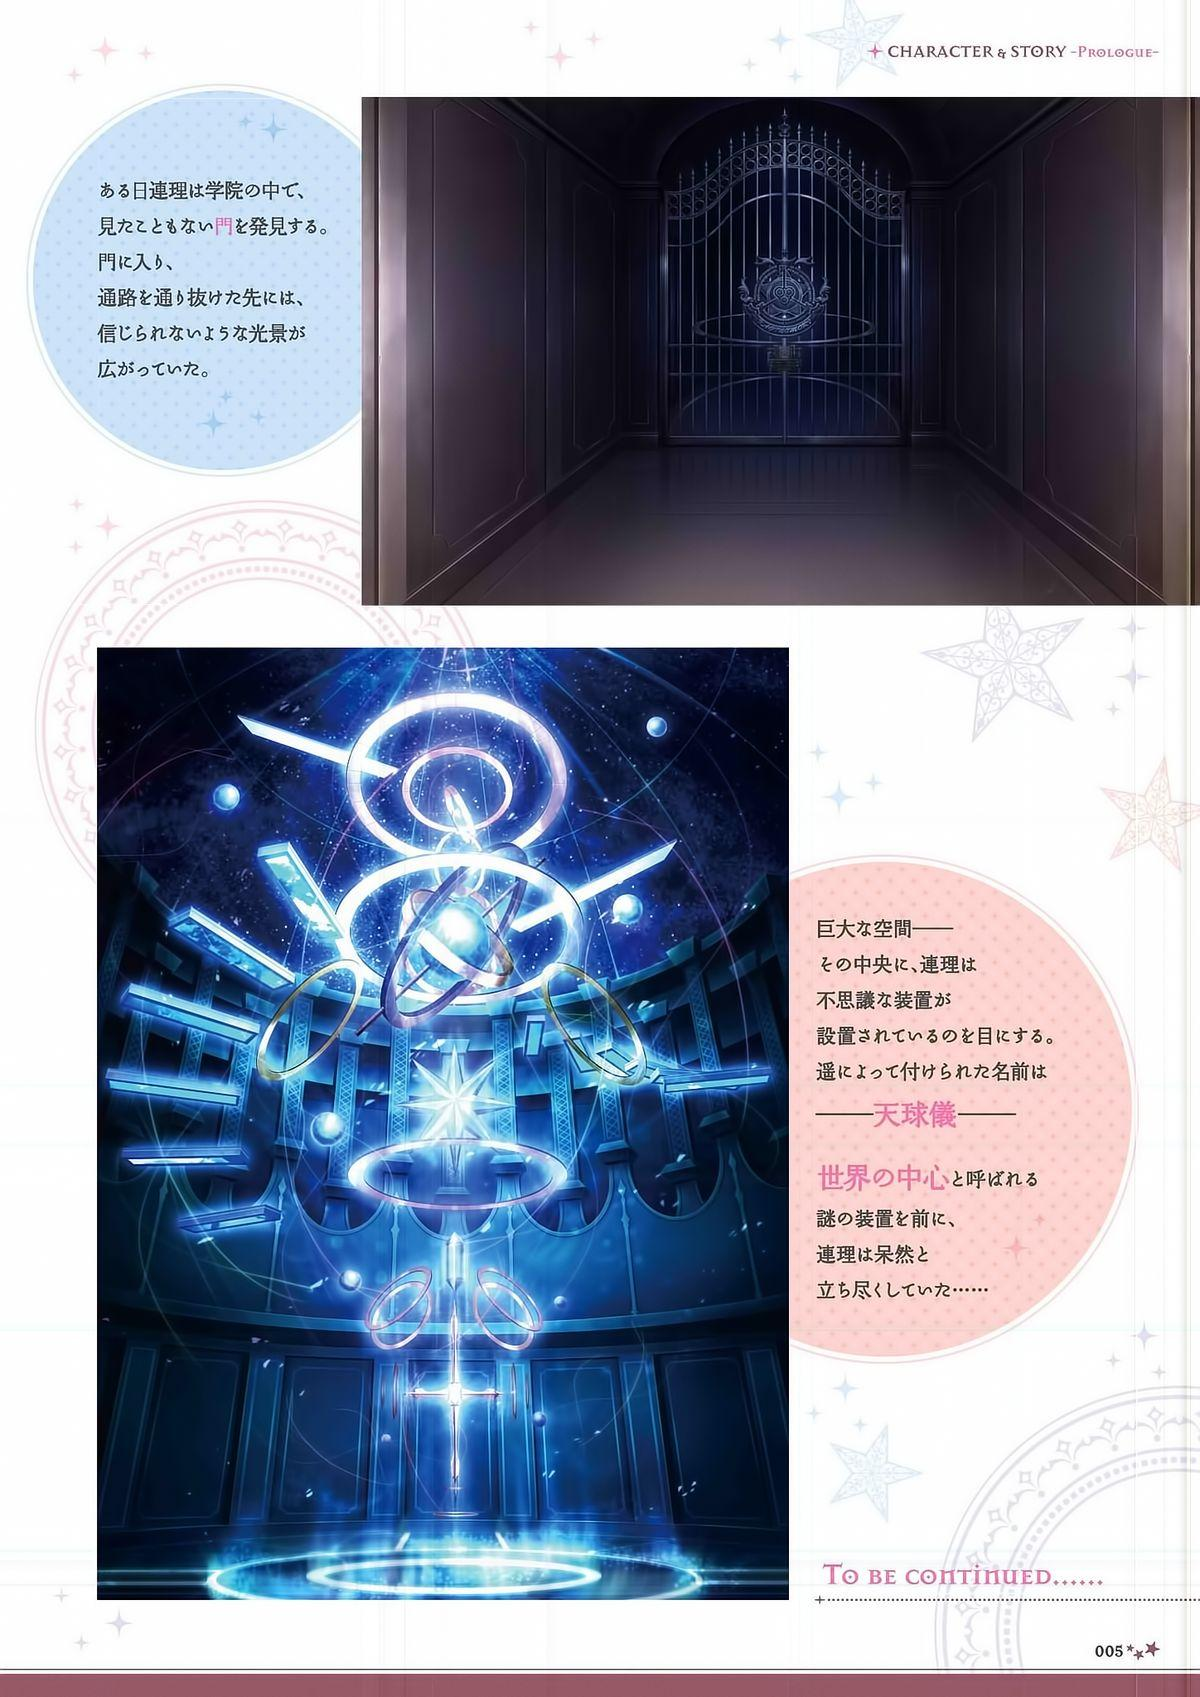 Sekai to Sekai no Mannaka de Visual Fanbook 6